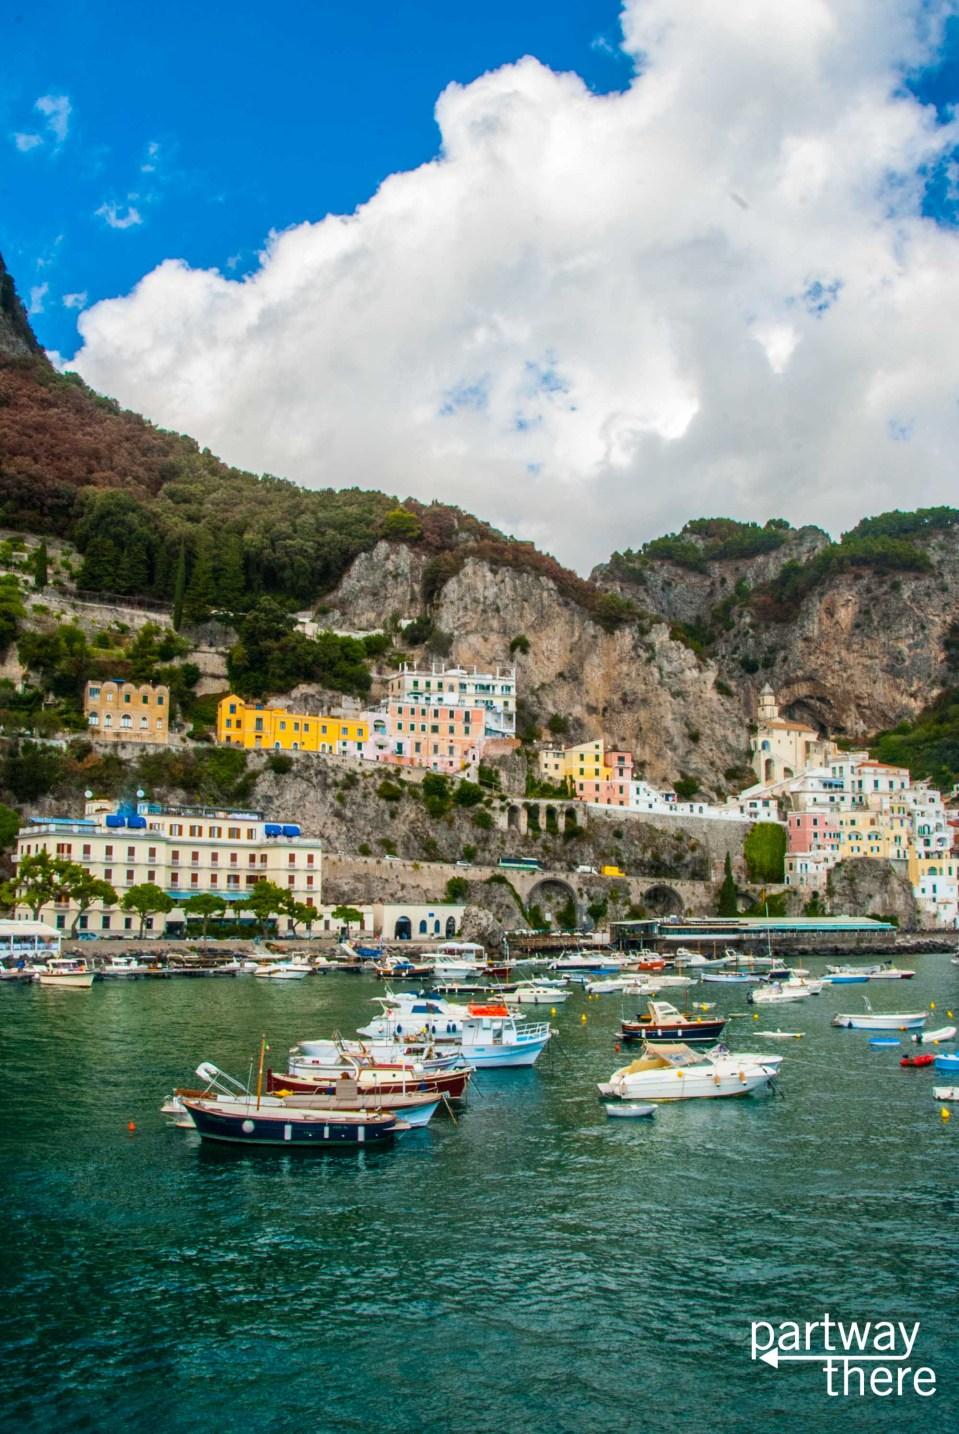 Photo of the town of Amalfi on the Amalfi Coast in Italy